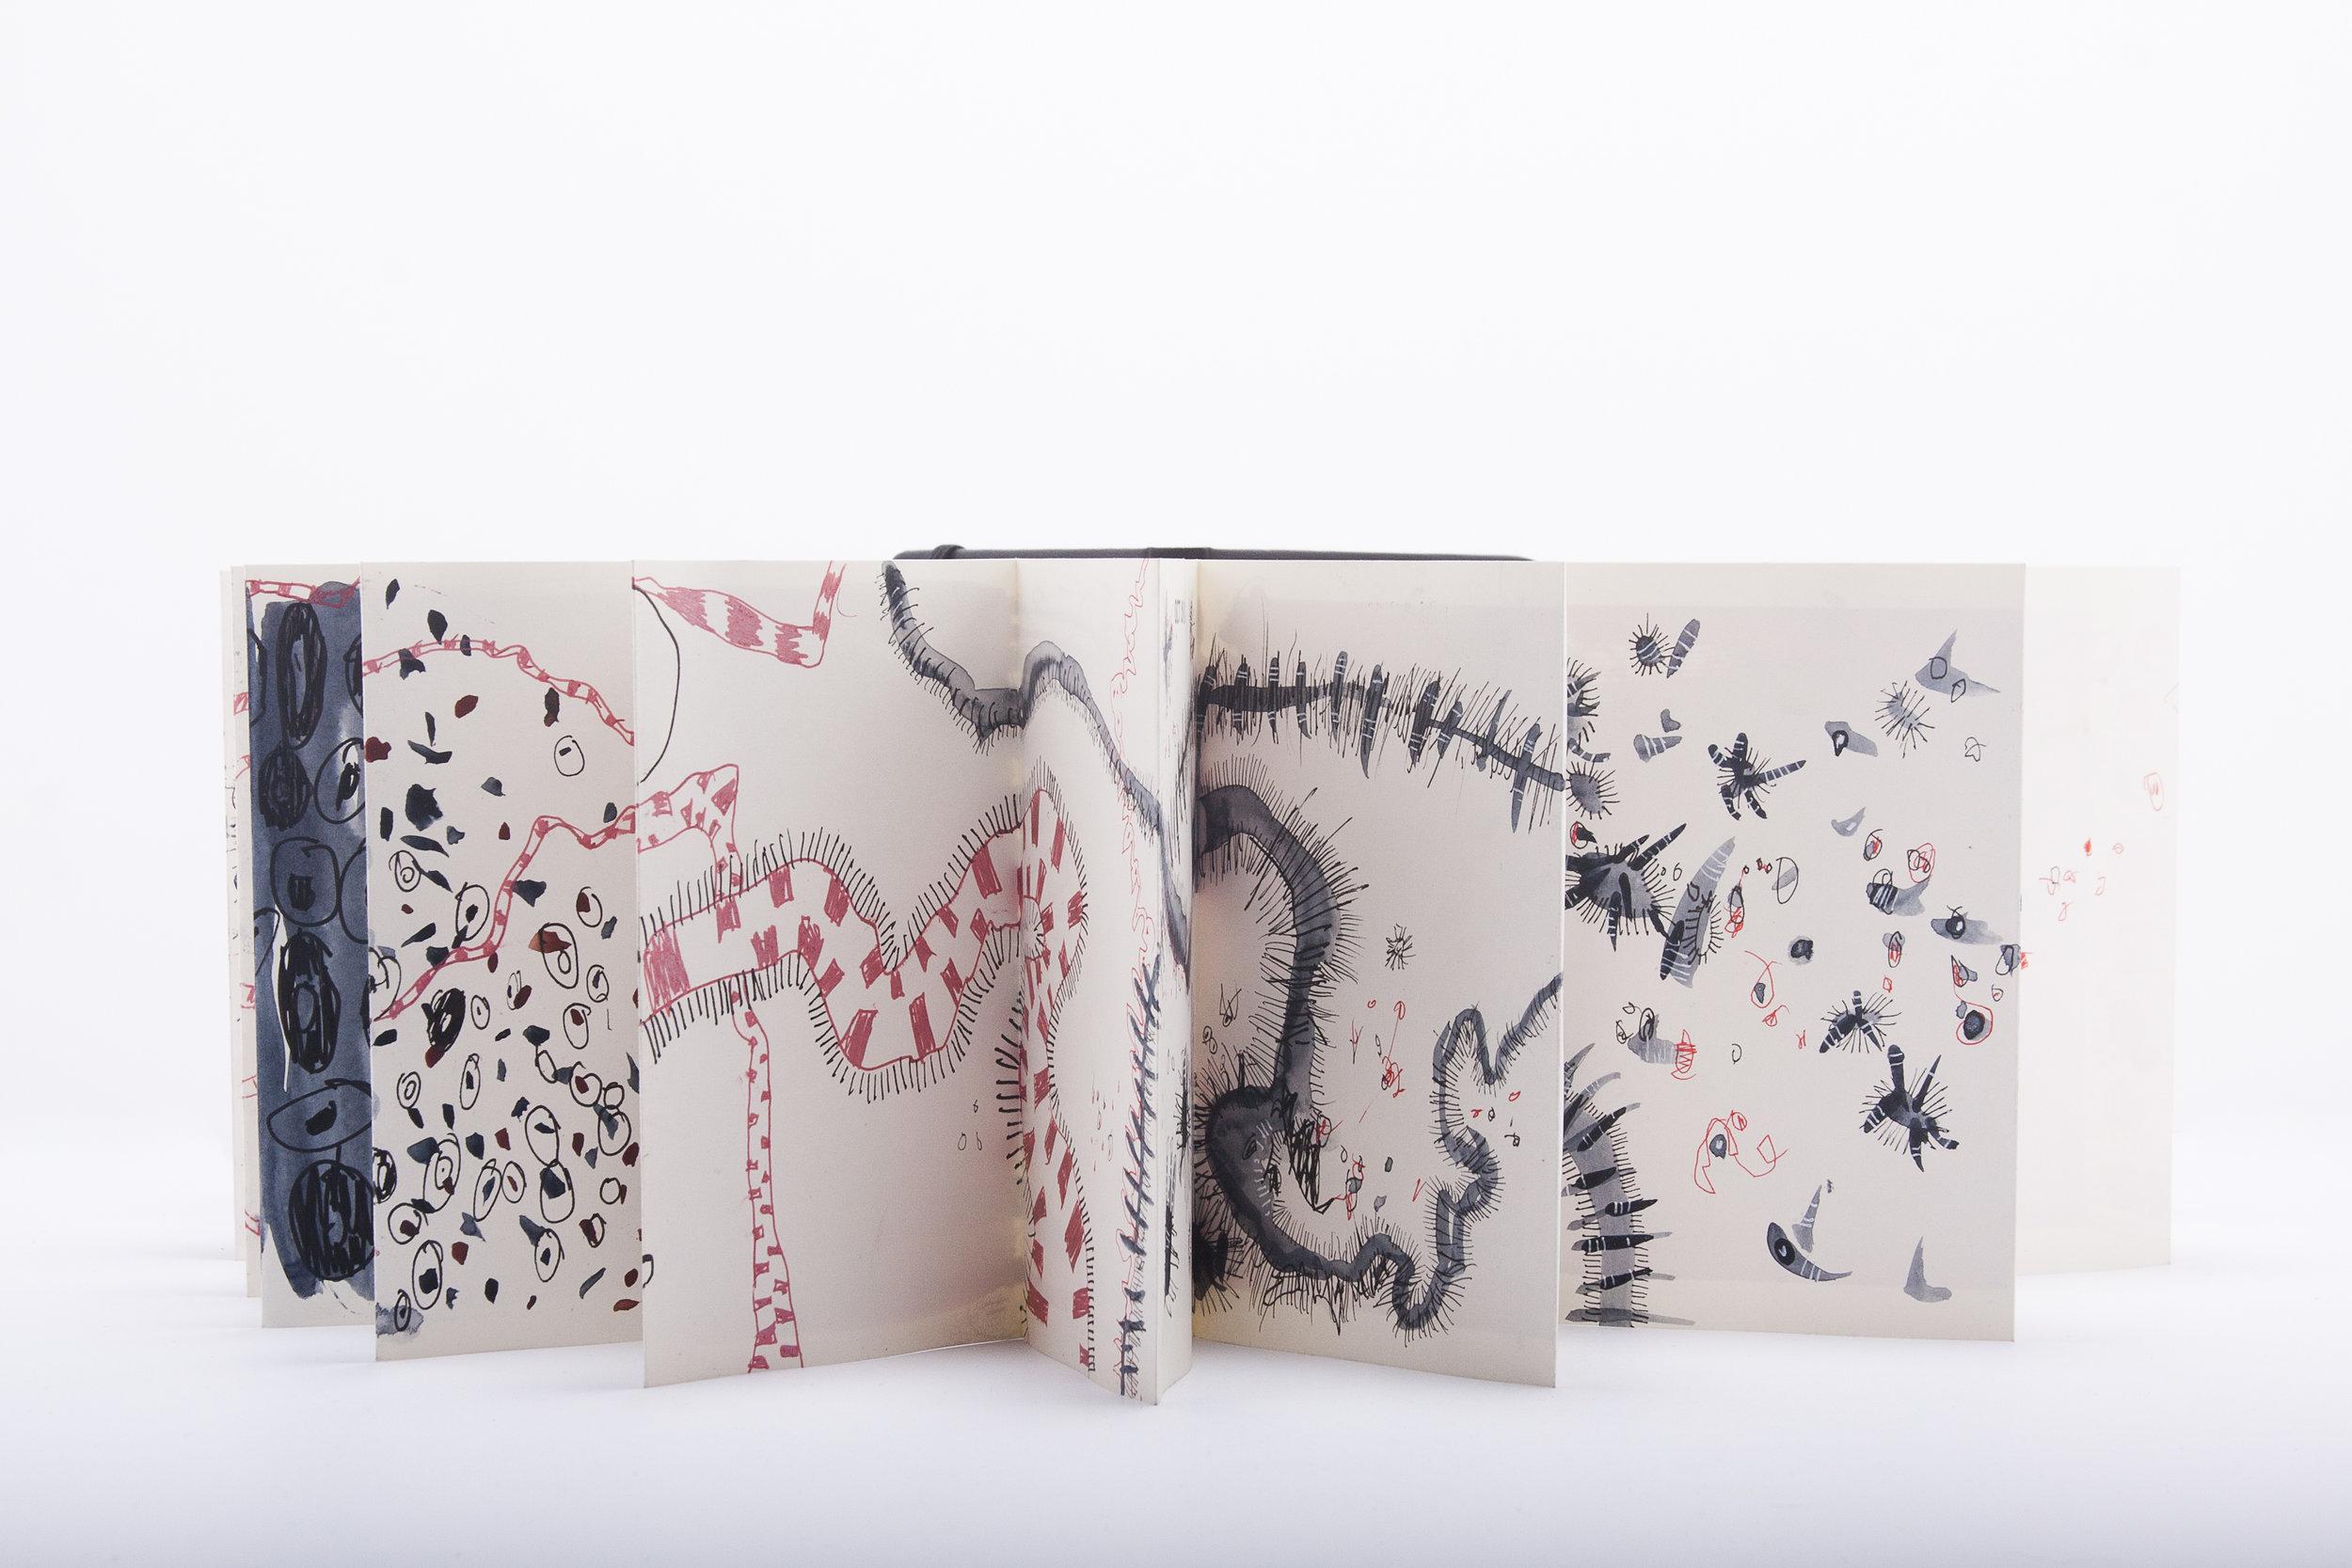 moss-sketchbook-small-10.jpg